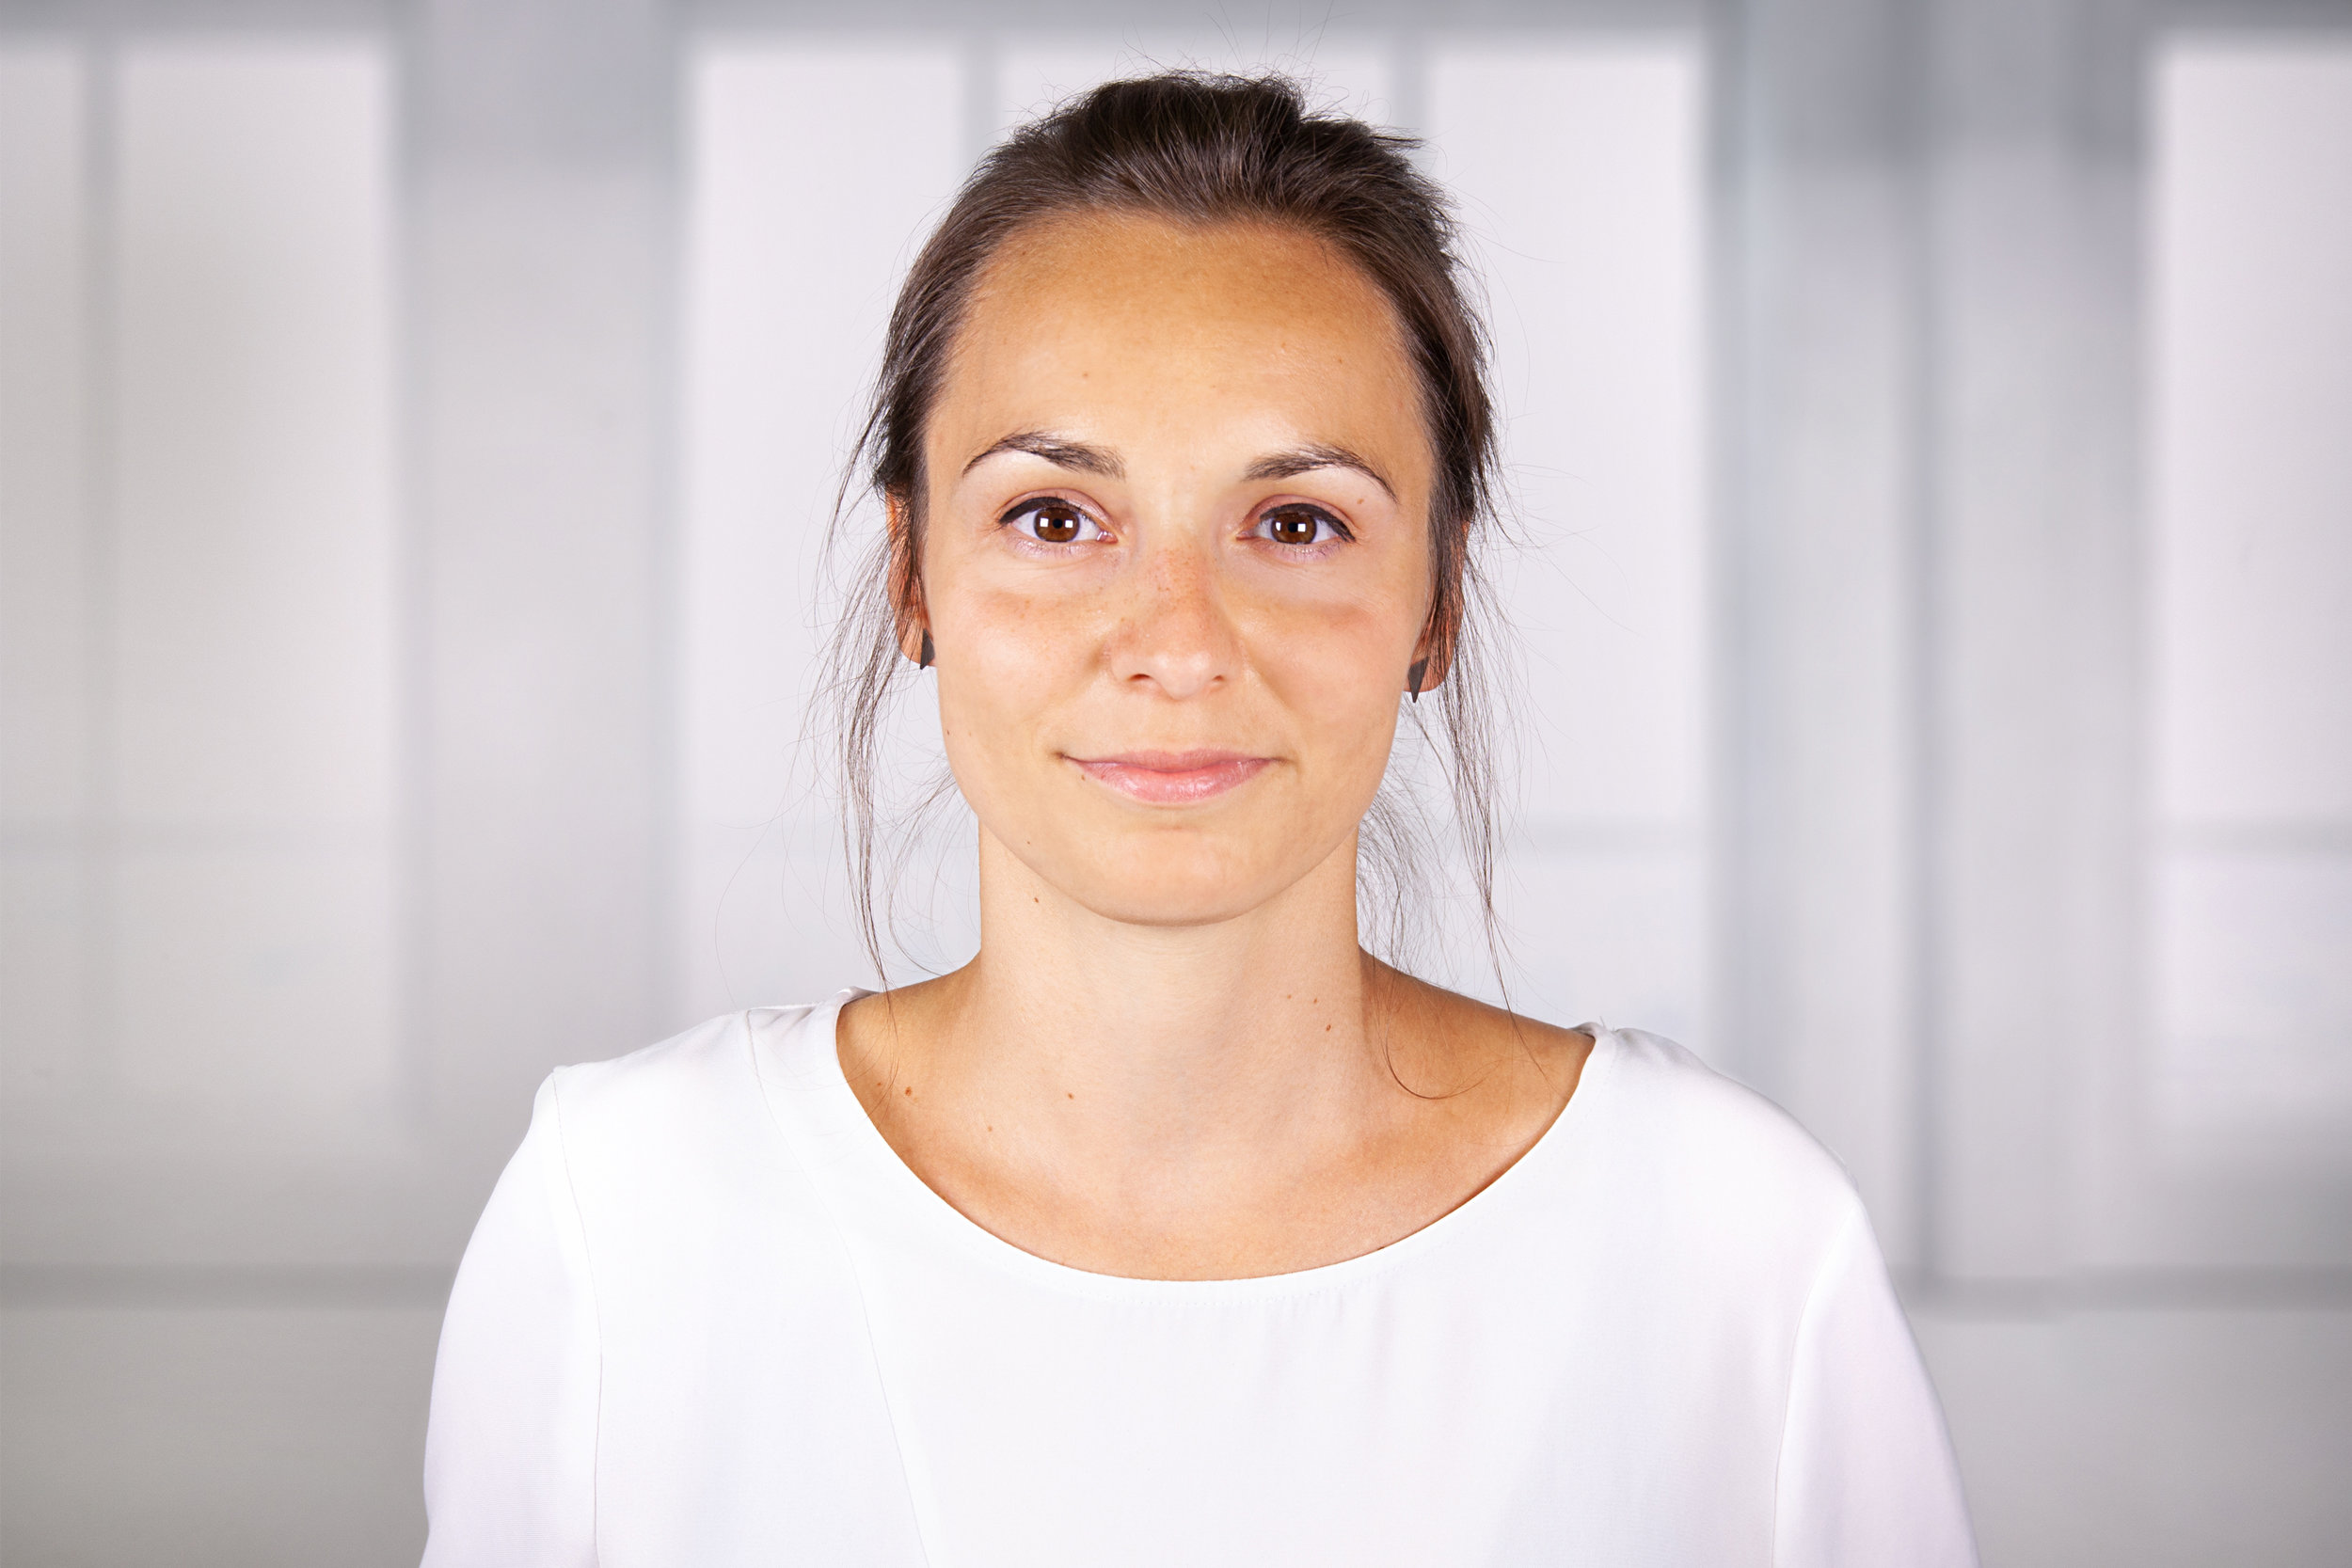 Elisa Thieme - Position: Market Research and Consumer IntegrationAlter:Heimat: Leipzig